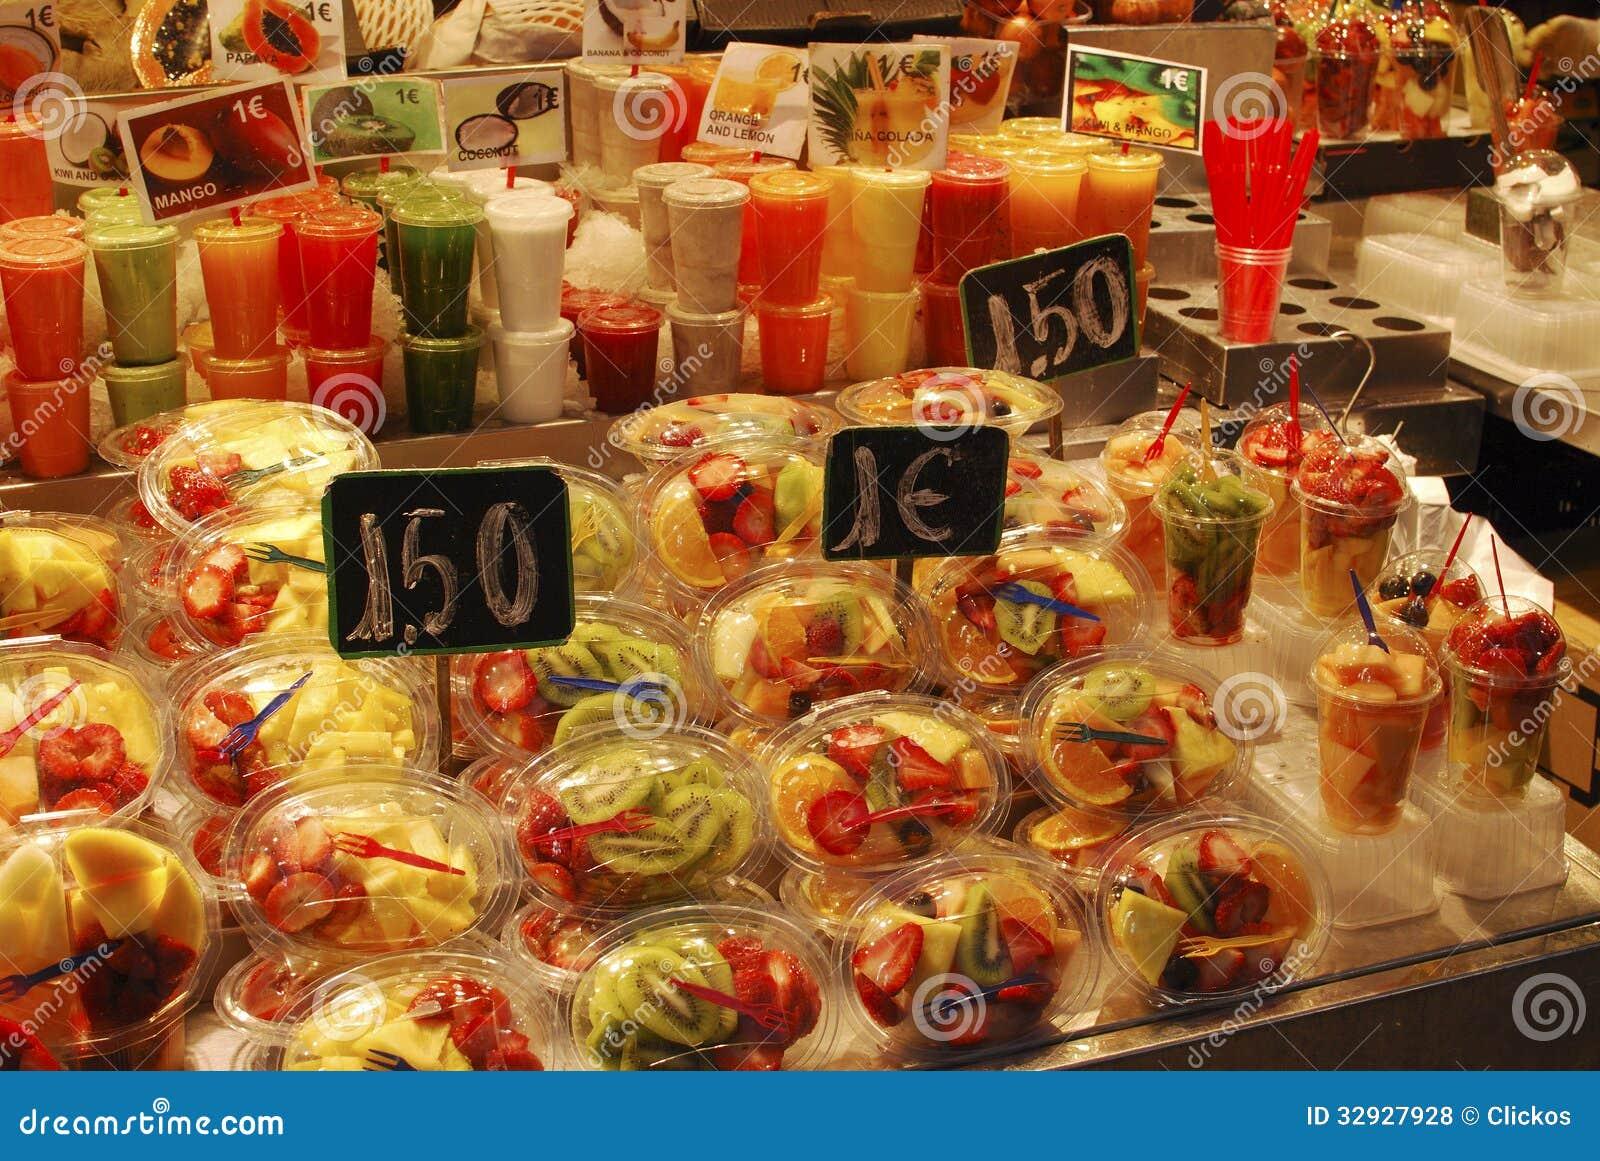 Barcelona Famous Food Market